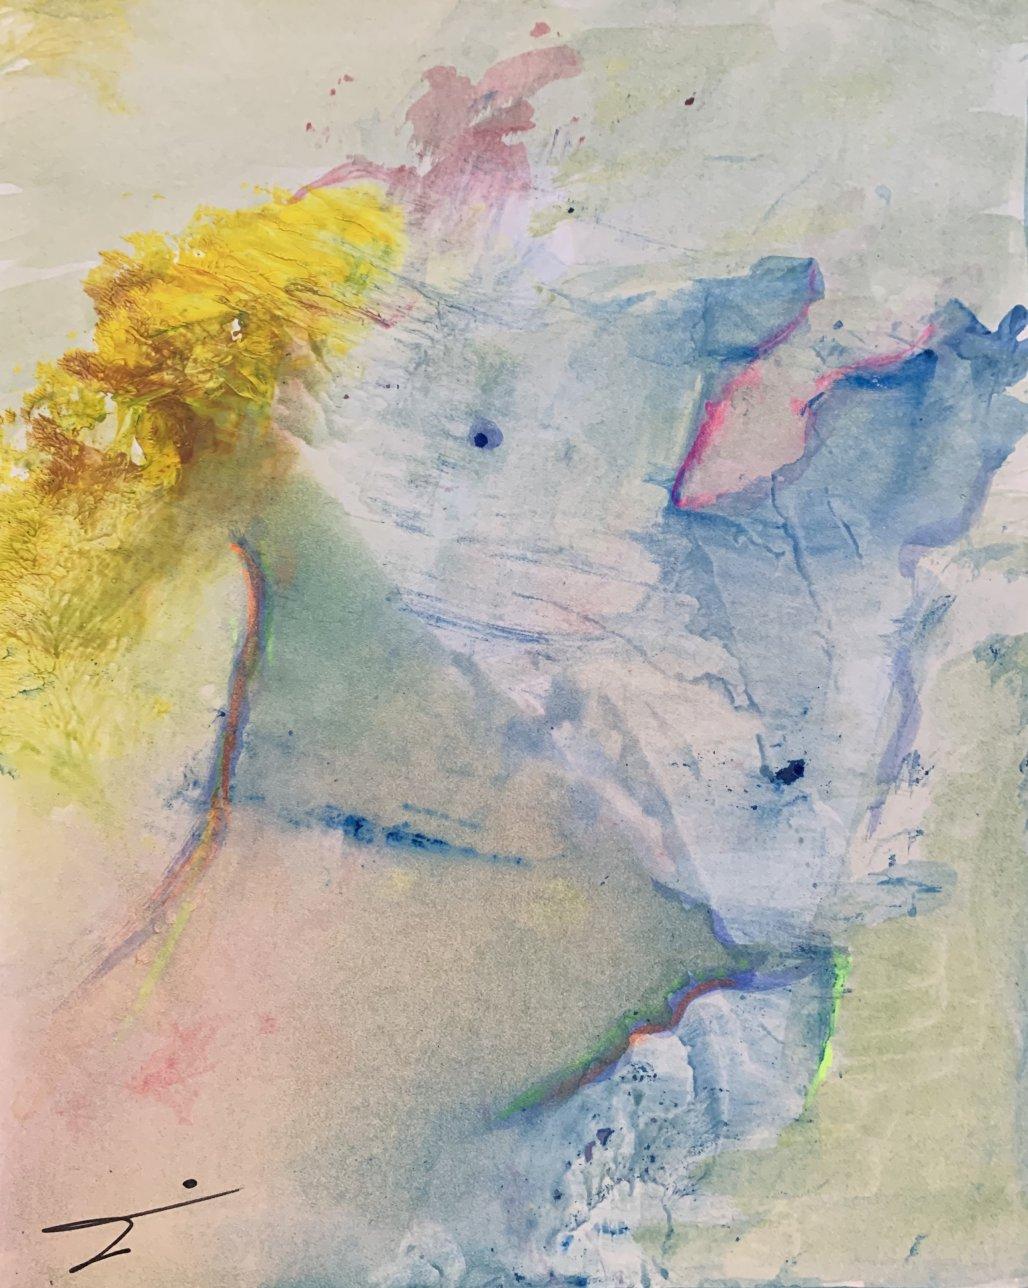 Cuerpo celeste I (2019) - Mauricio Alfaro